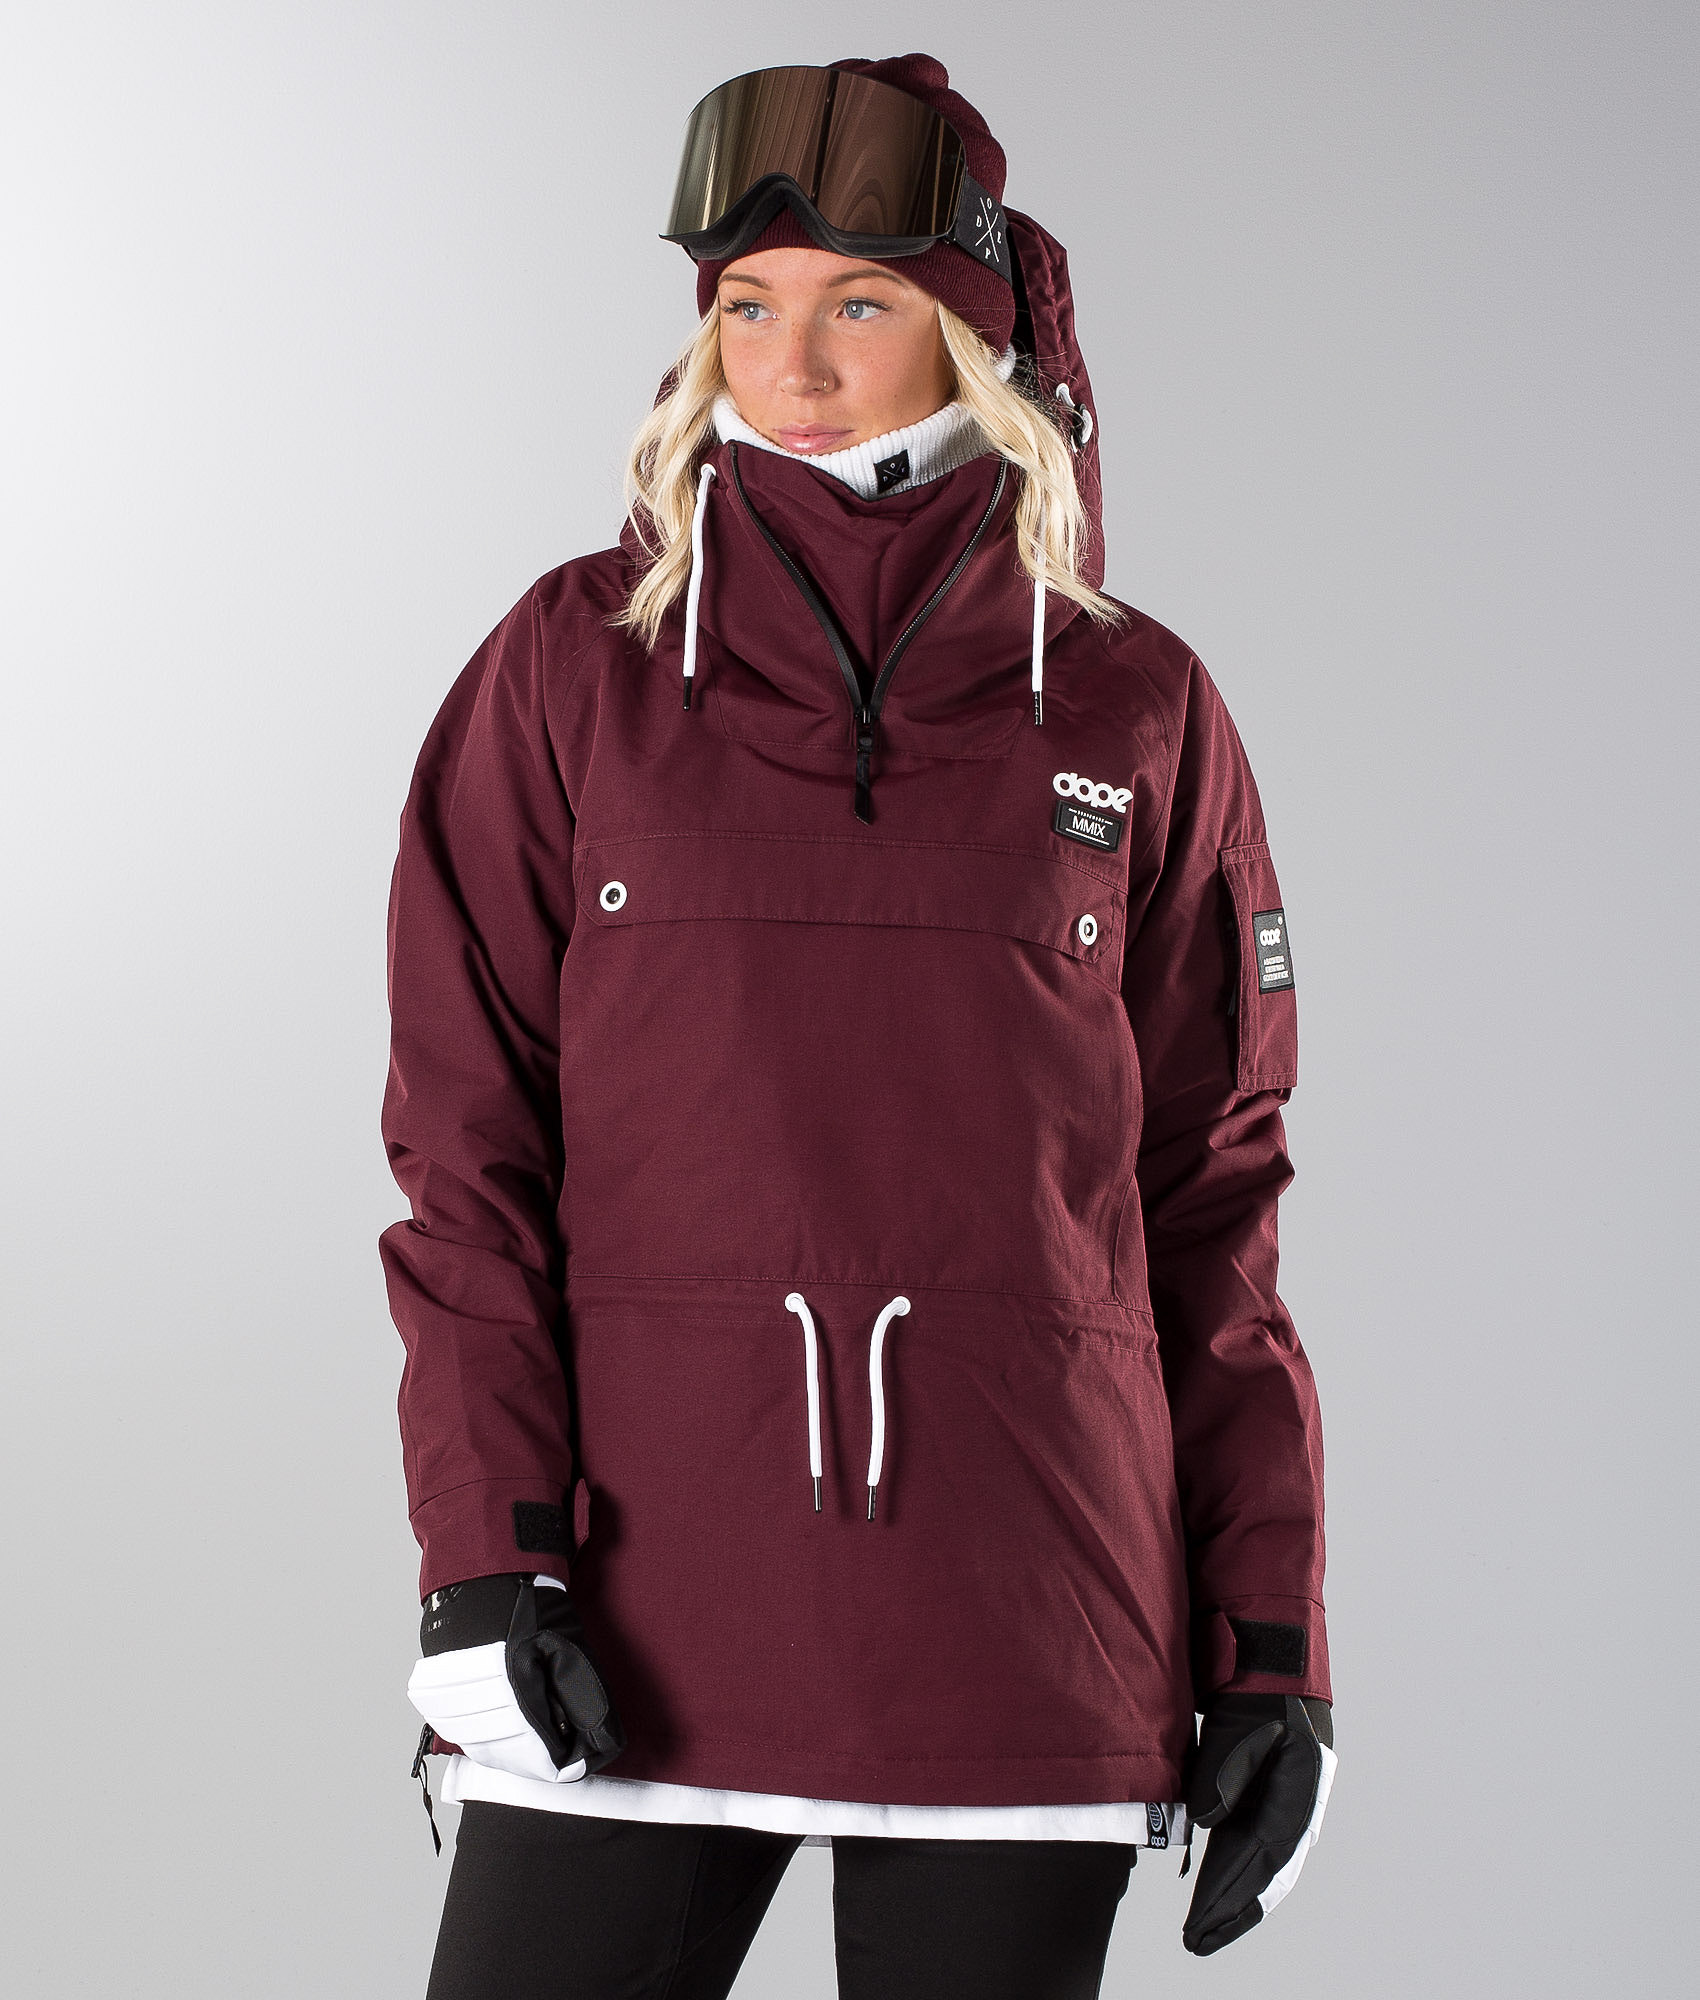 Dope Annok W Snowboard Jacket Burgundy - Ridestore.com 2b964db0dc98